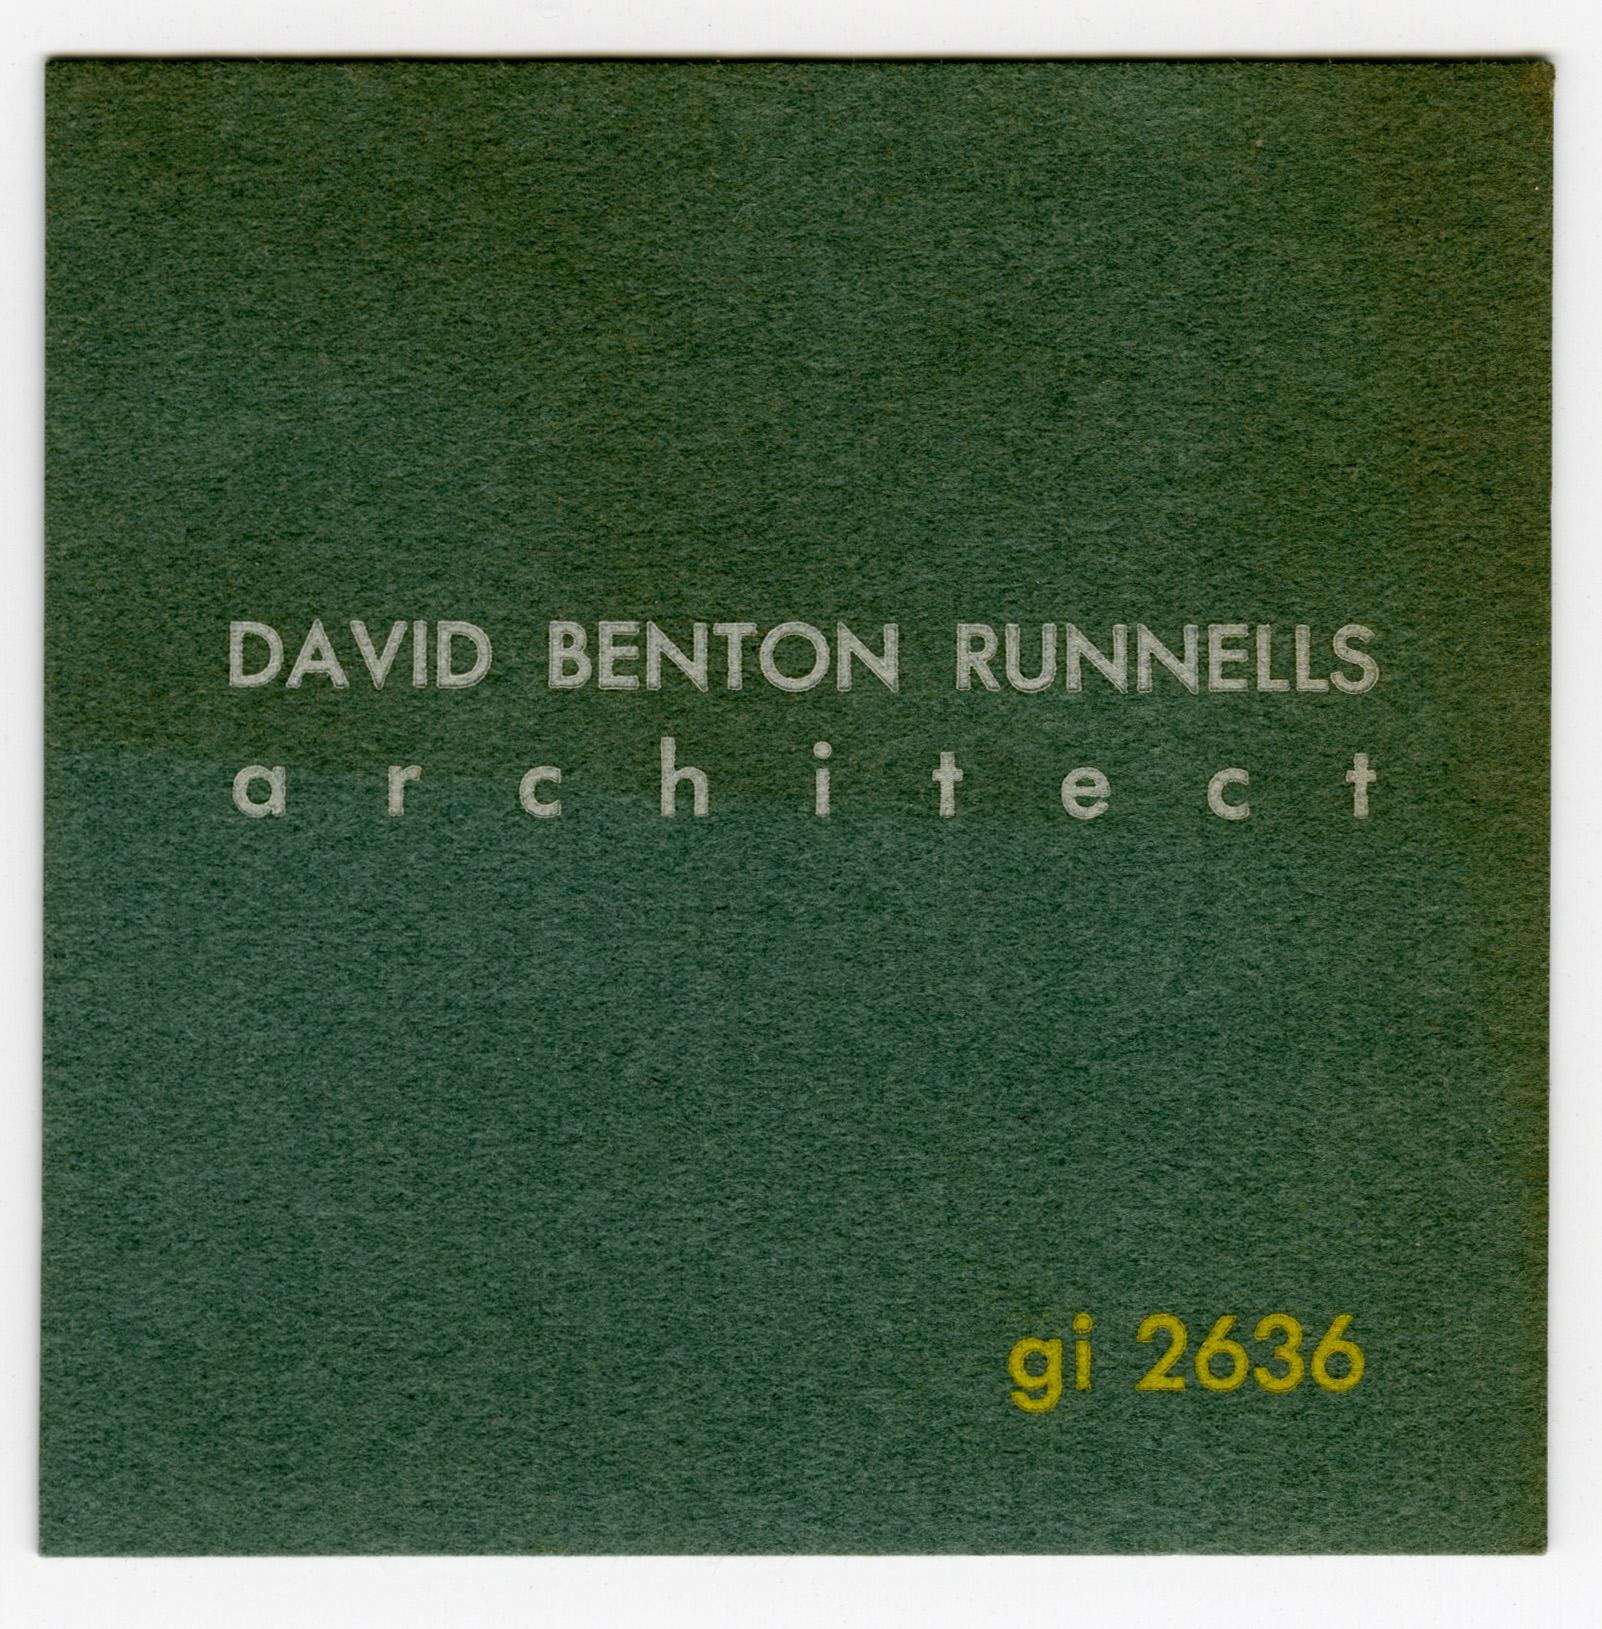 Runnells Card.jpg